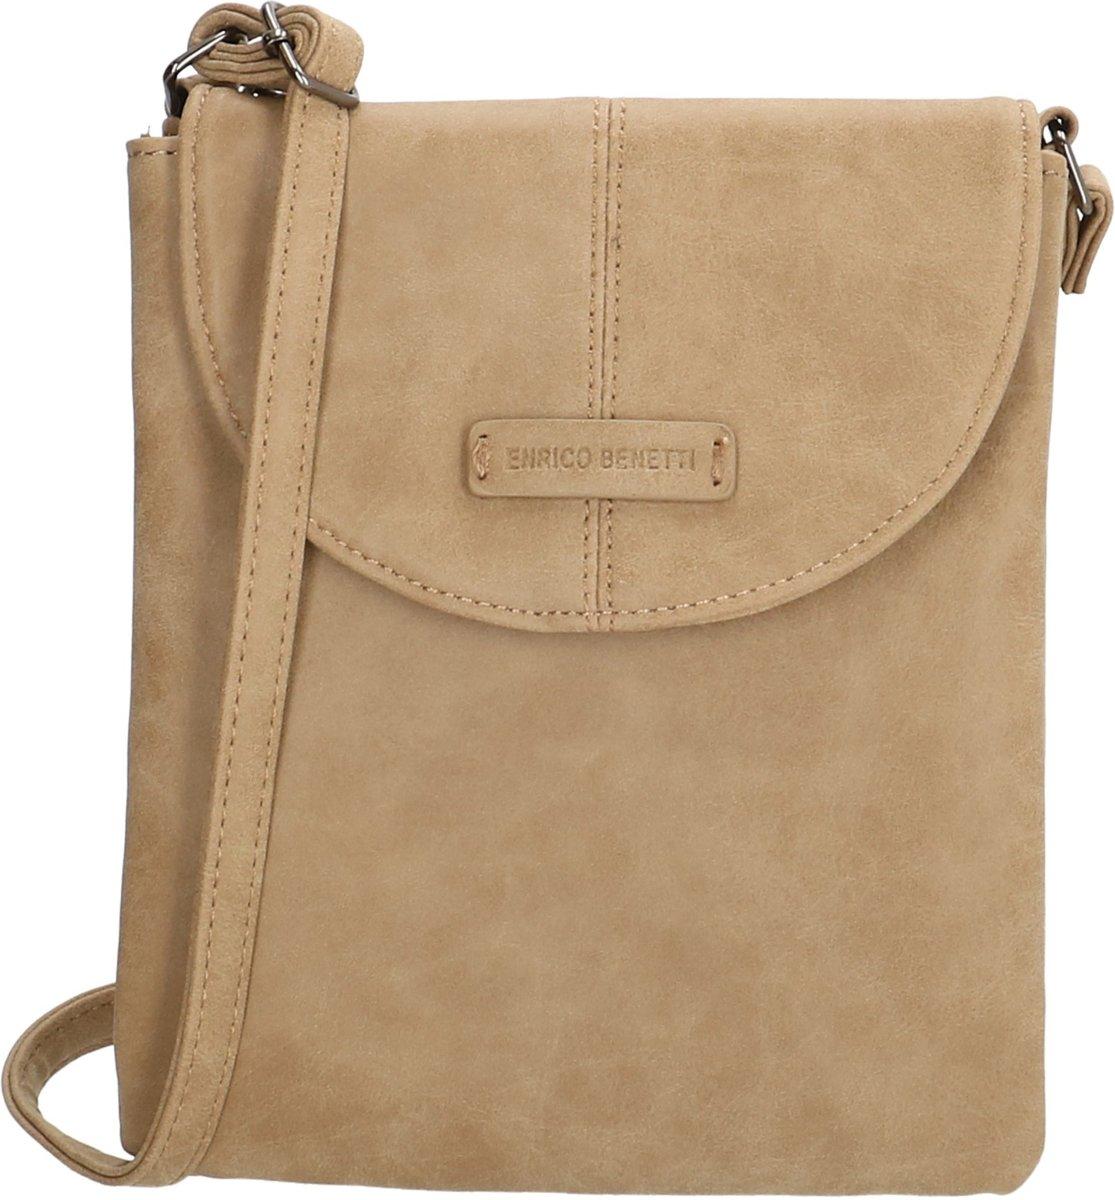 Adidas Originals AC Messenger Bag pefect for small laptops or as Airline Handbagage